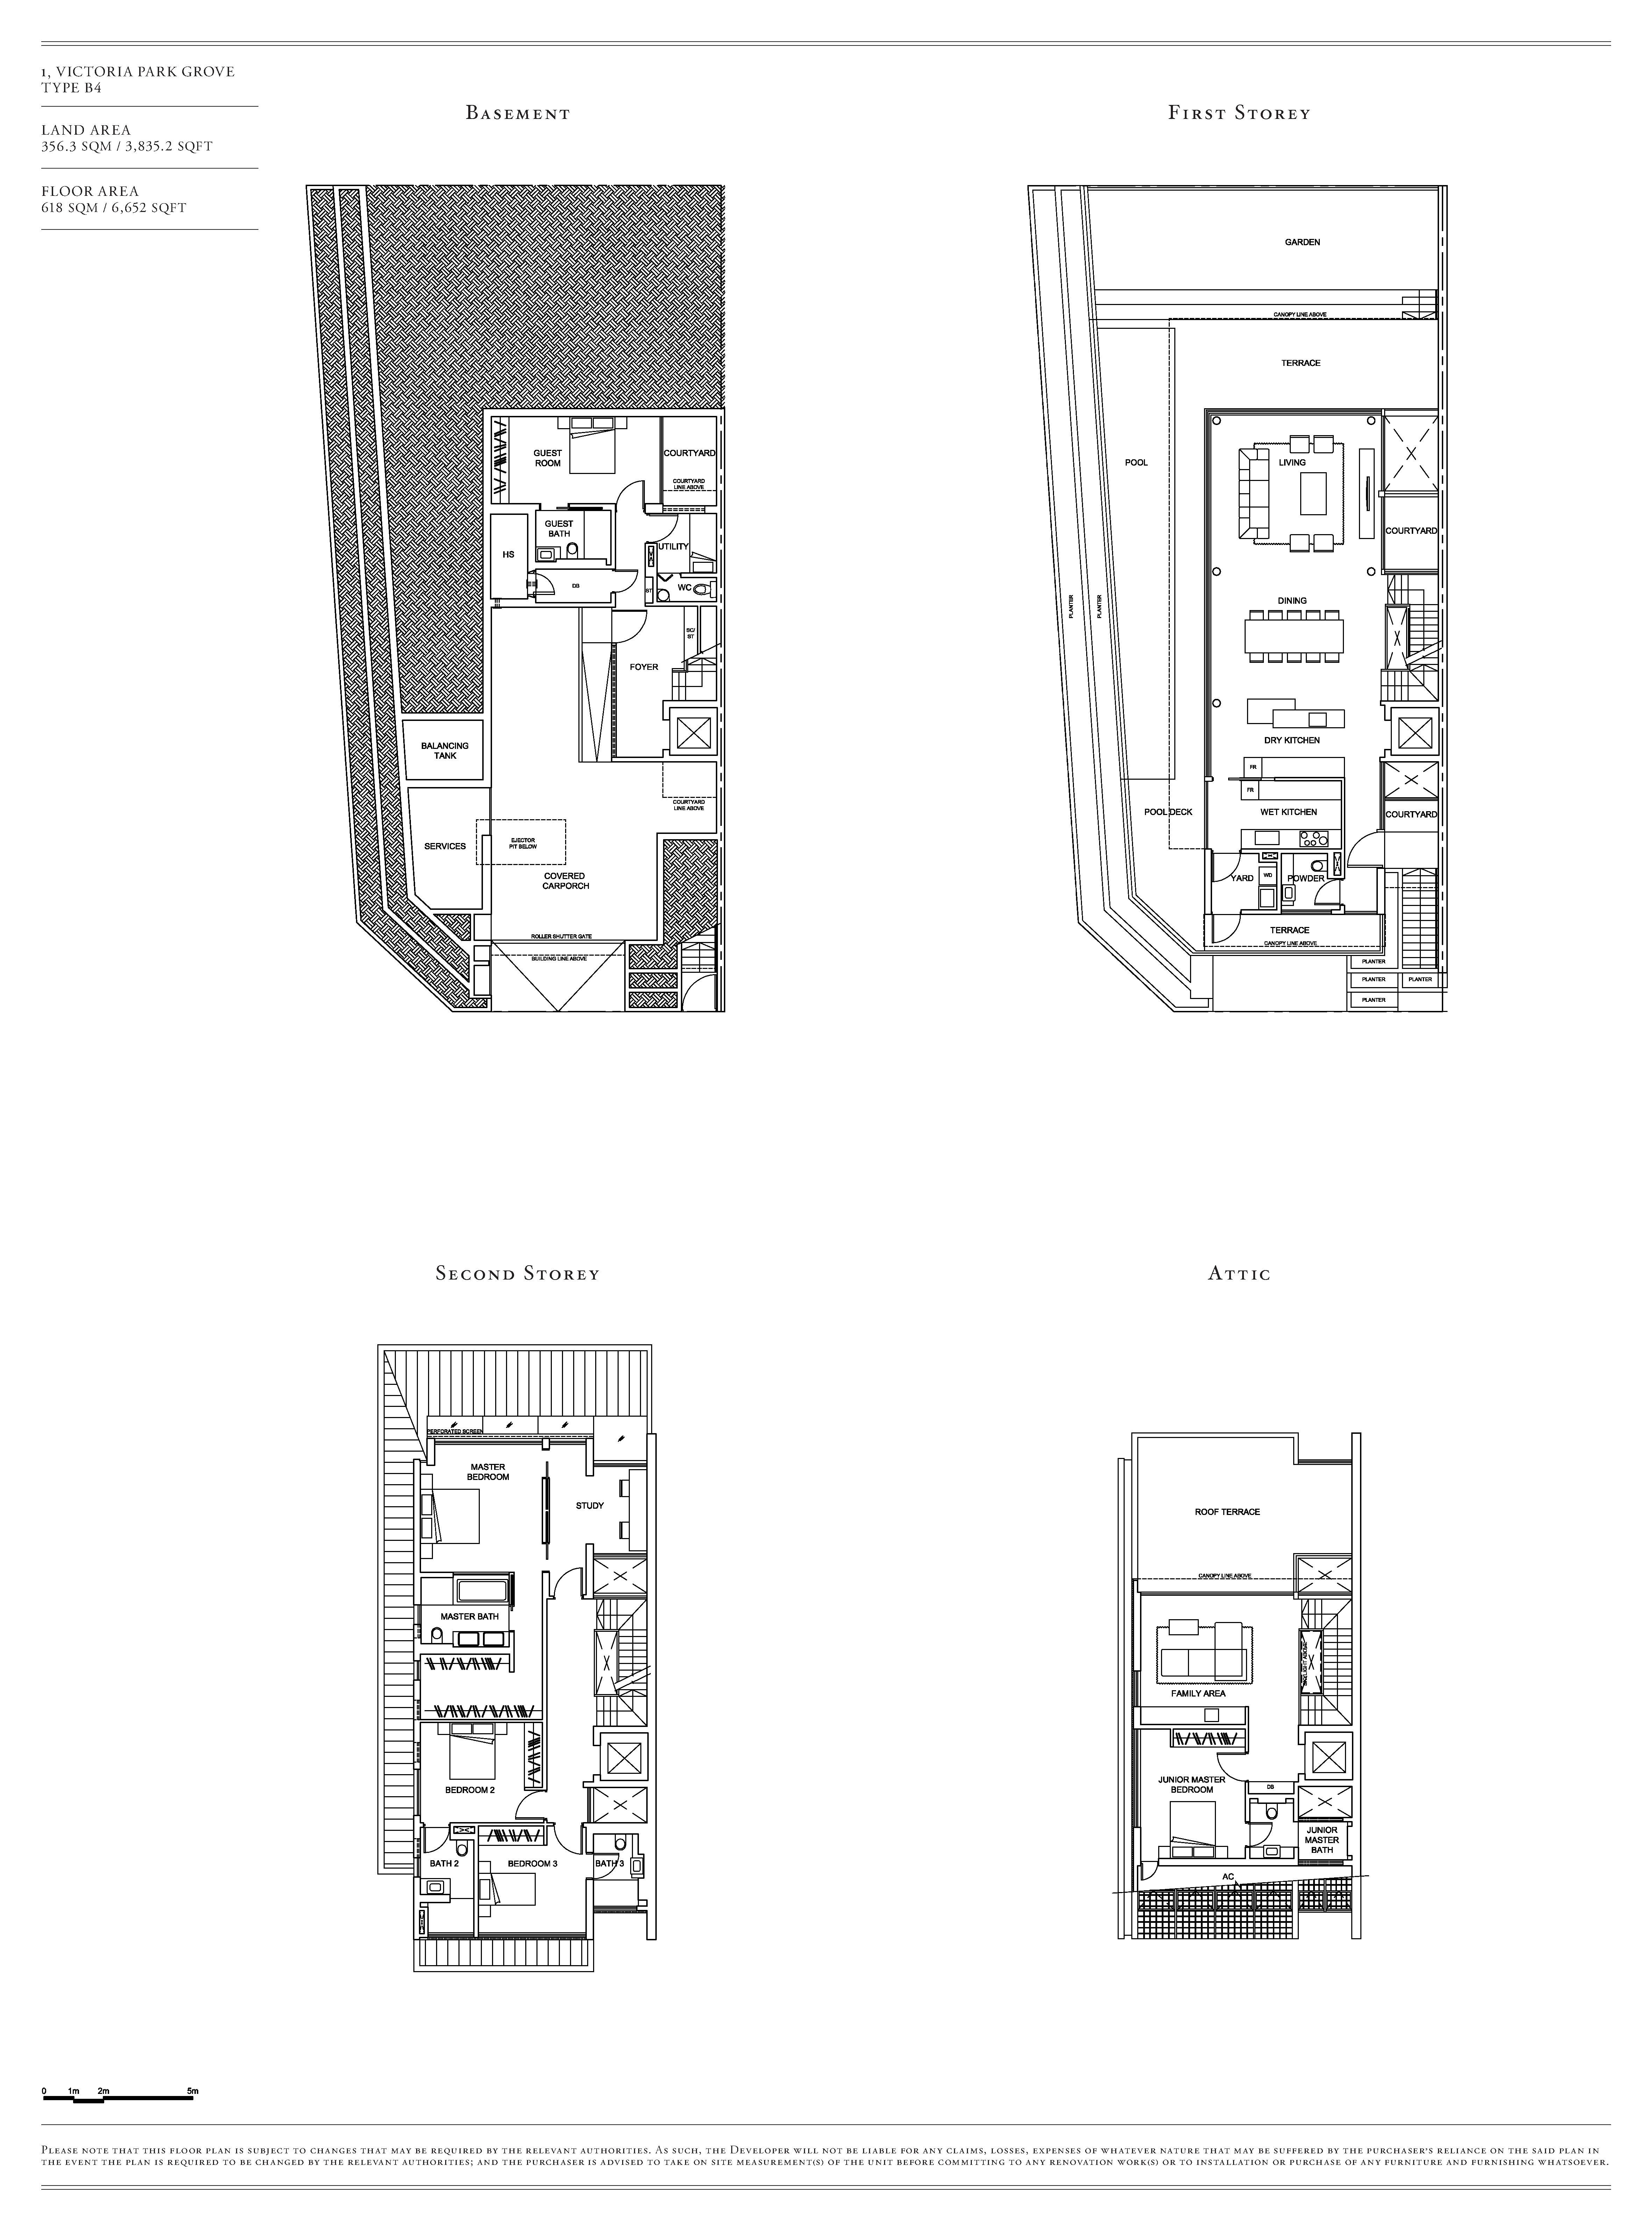 Victoria Park Villas House 1 Type B4 Floor Plans